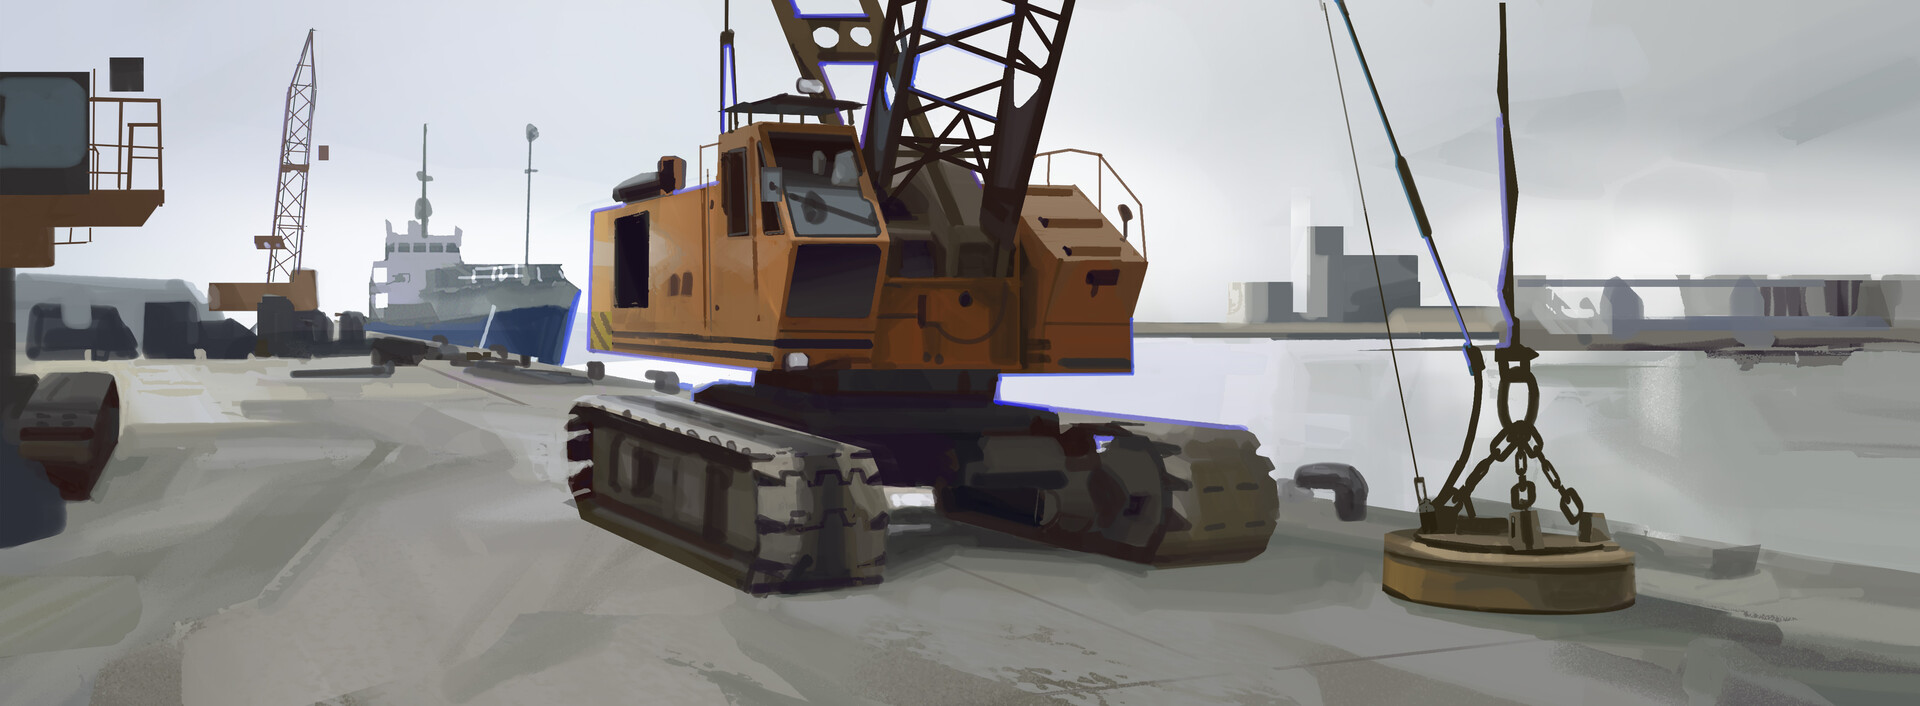 Adrien girod vpa japan shipcrane02 2018 01